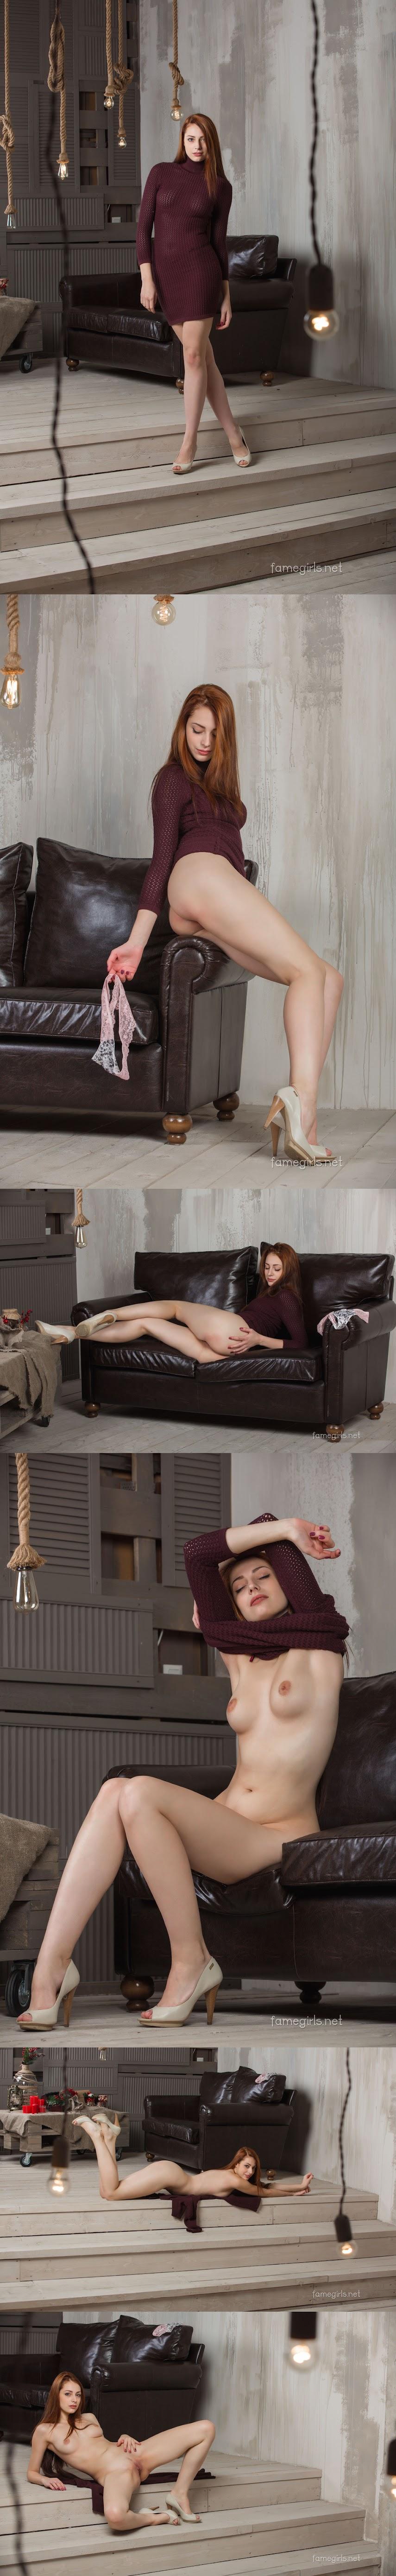 FameGirls Isabella- 051 x1193840x5760